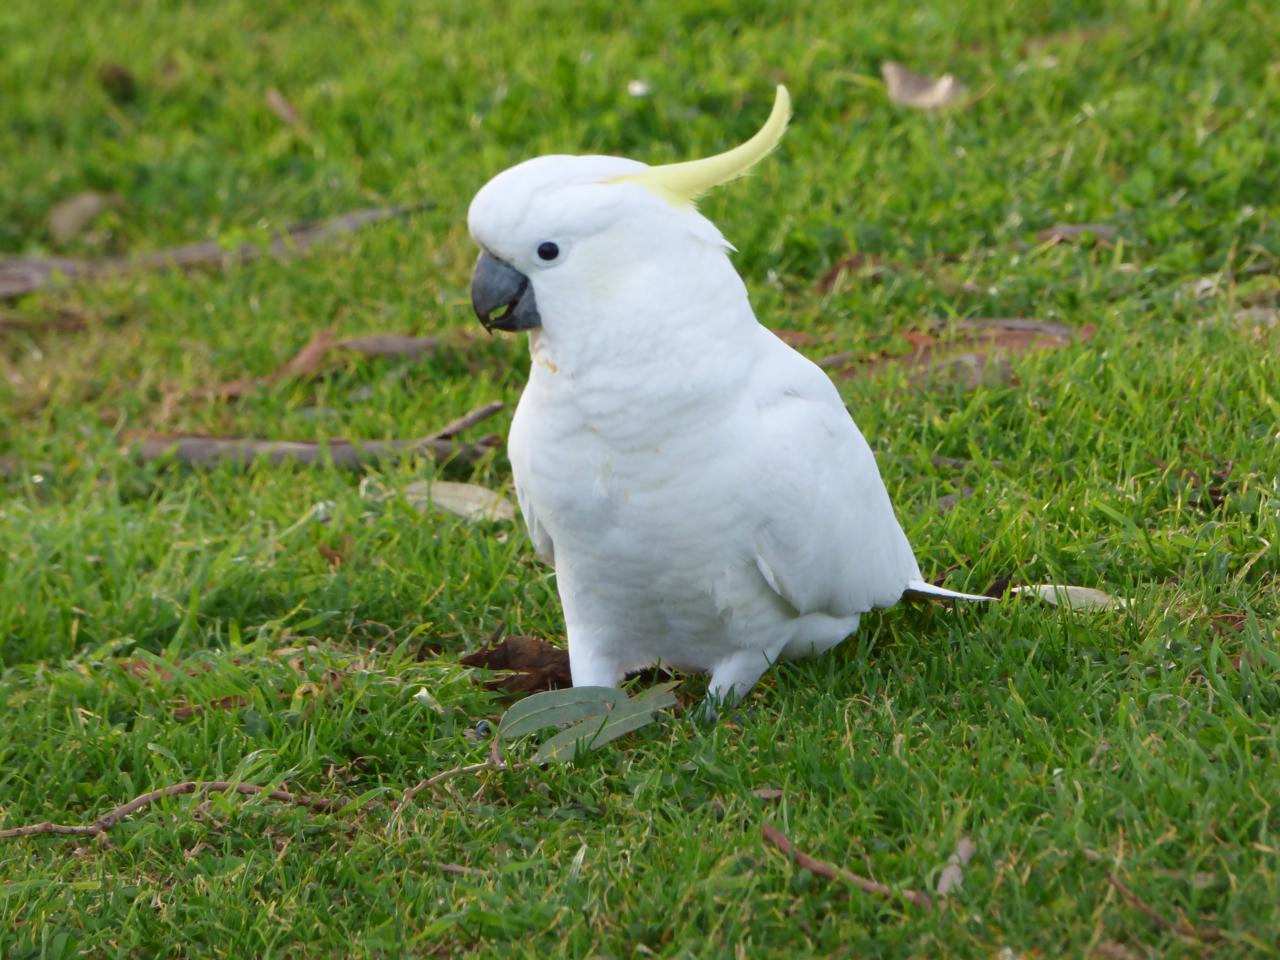 Cockatoo in Australia